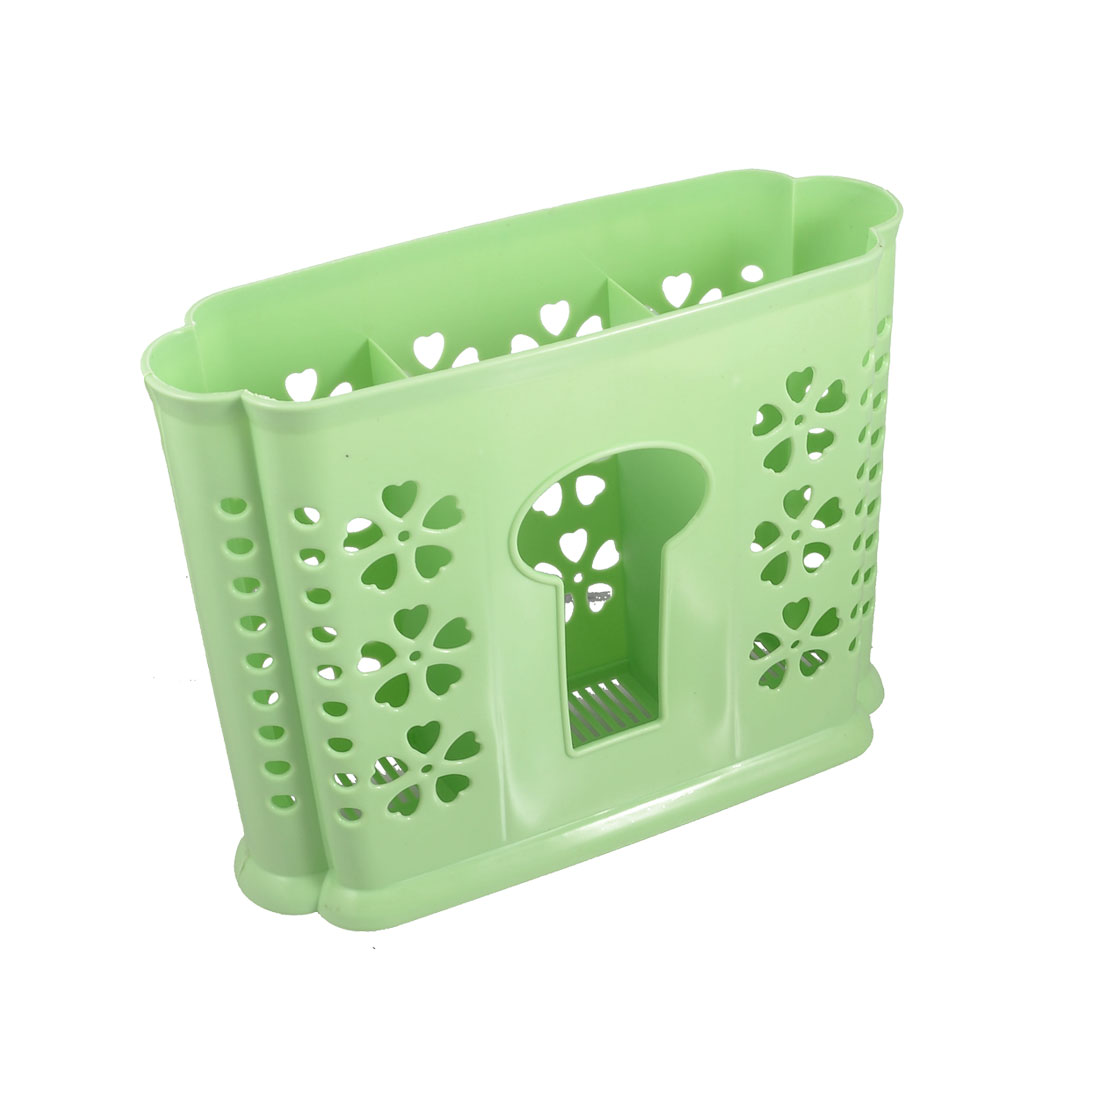 Green Plastic 3 Compartments Chopsticks Case Organizer